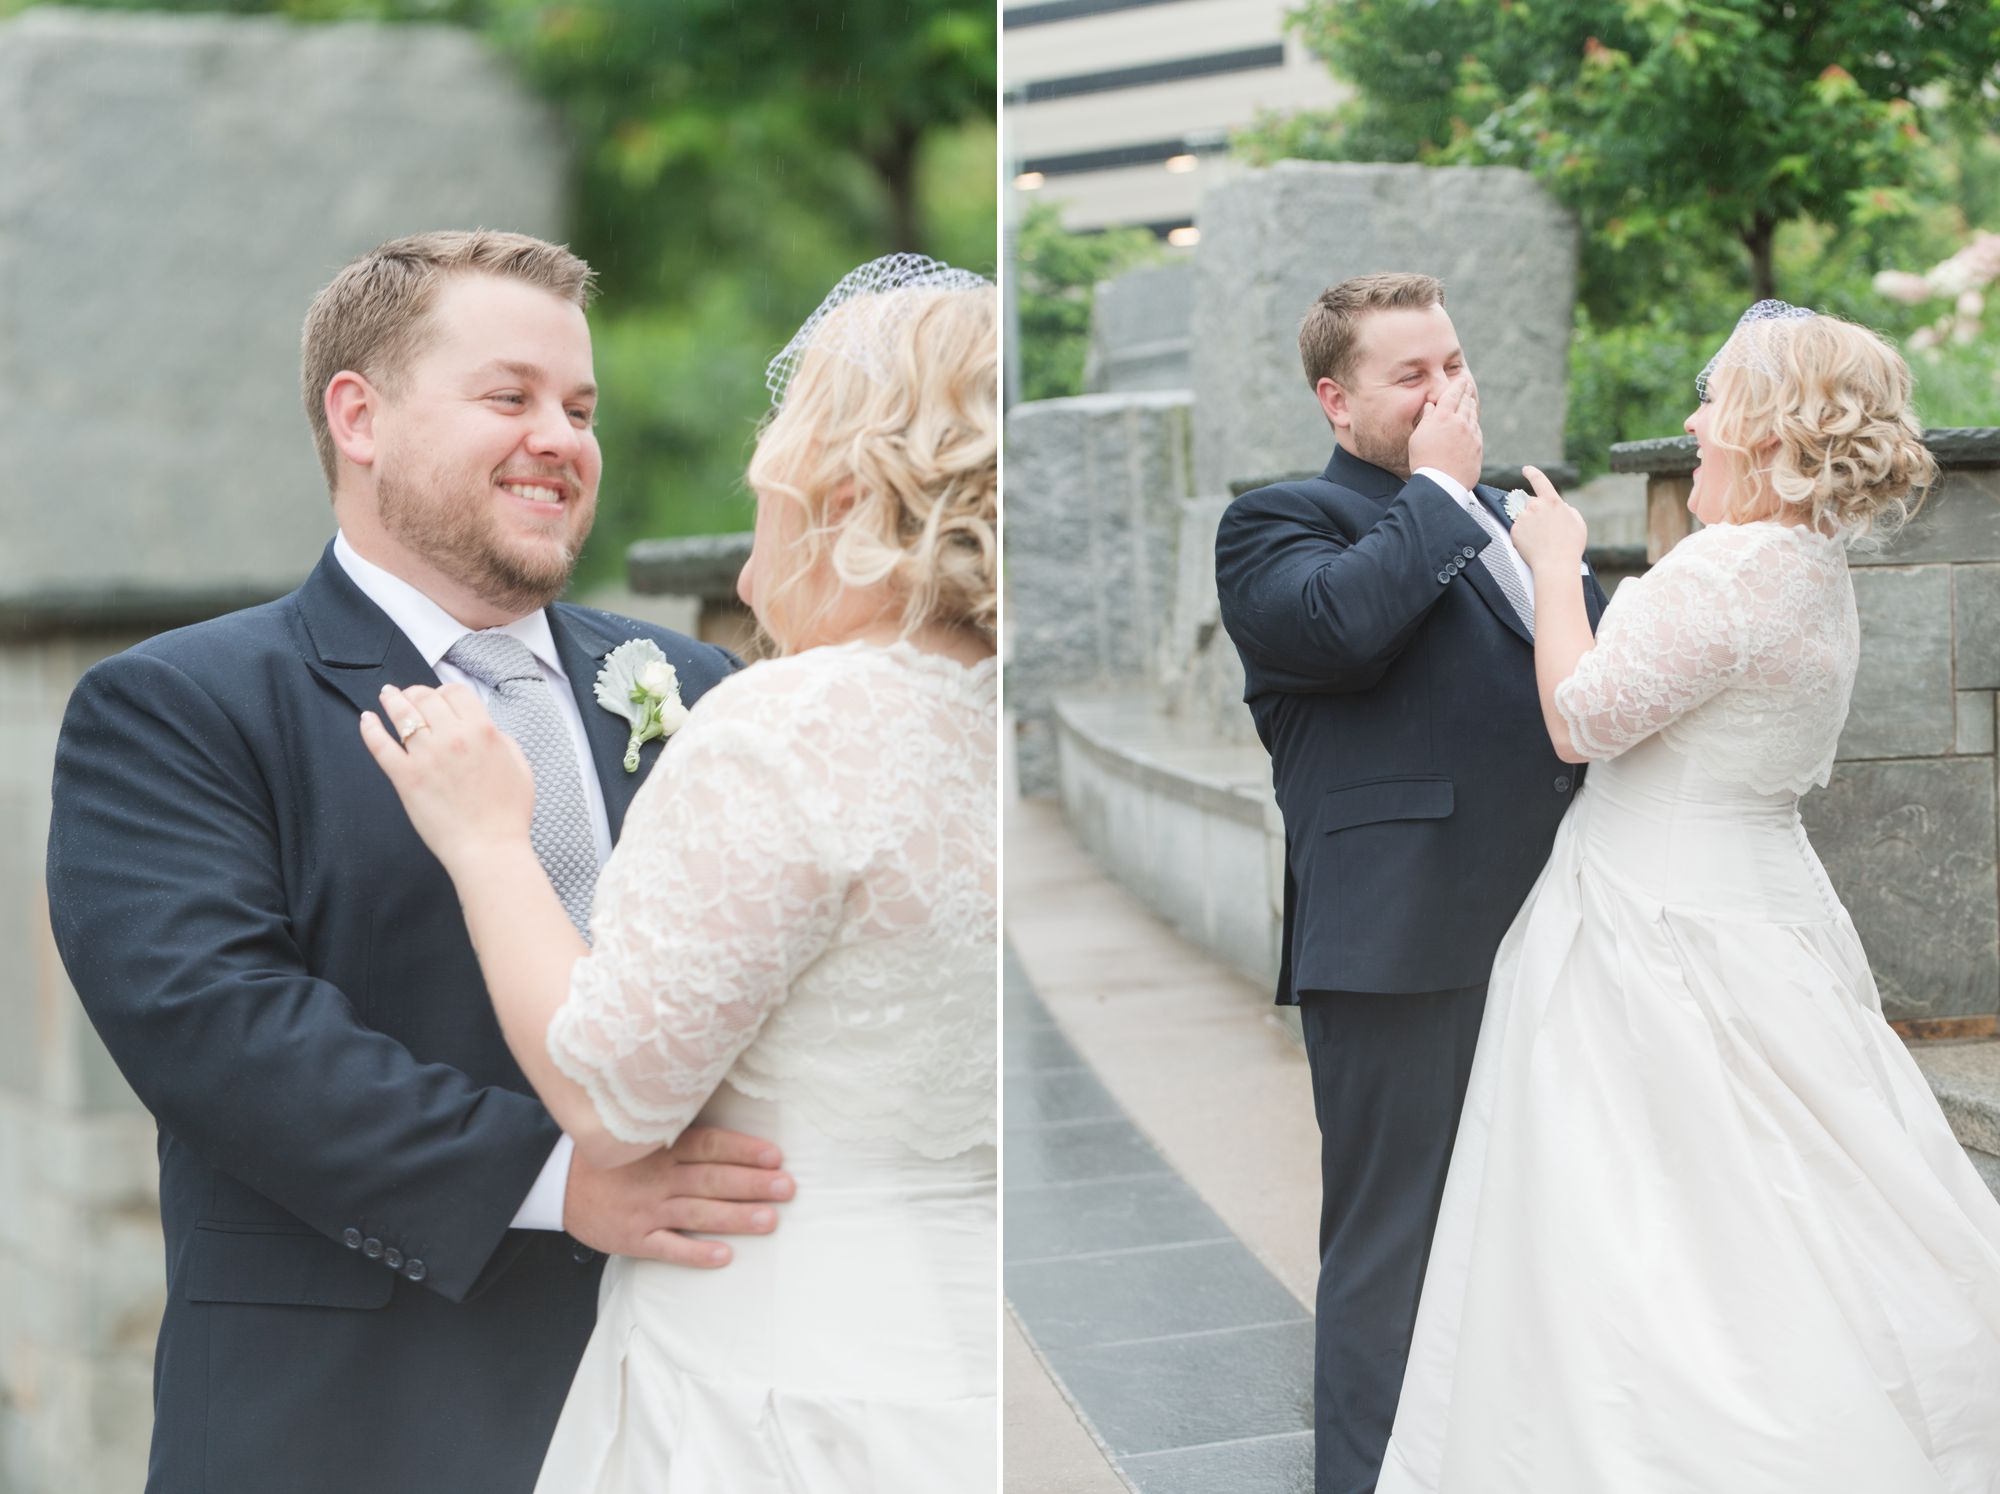 uptown-charlotte-warhouse-wedding 33